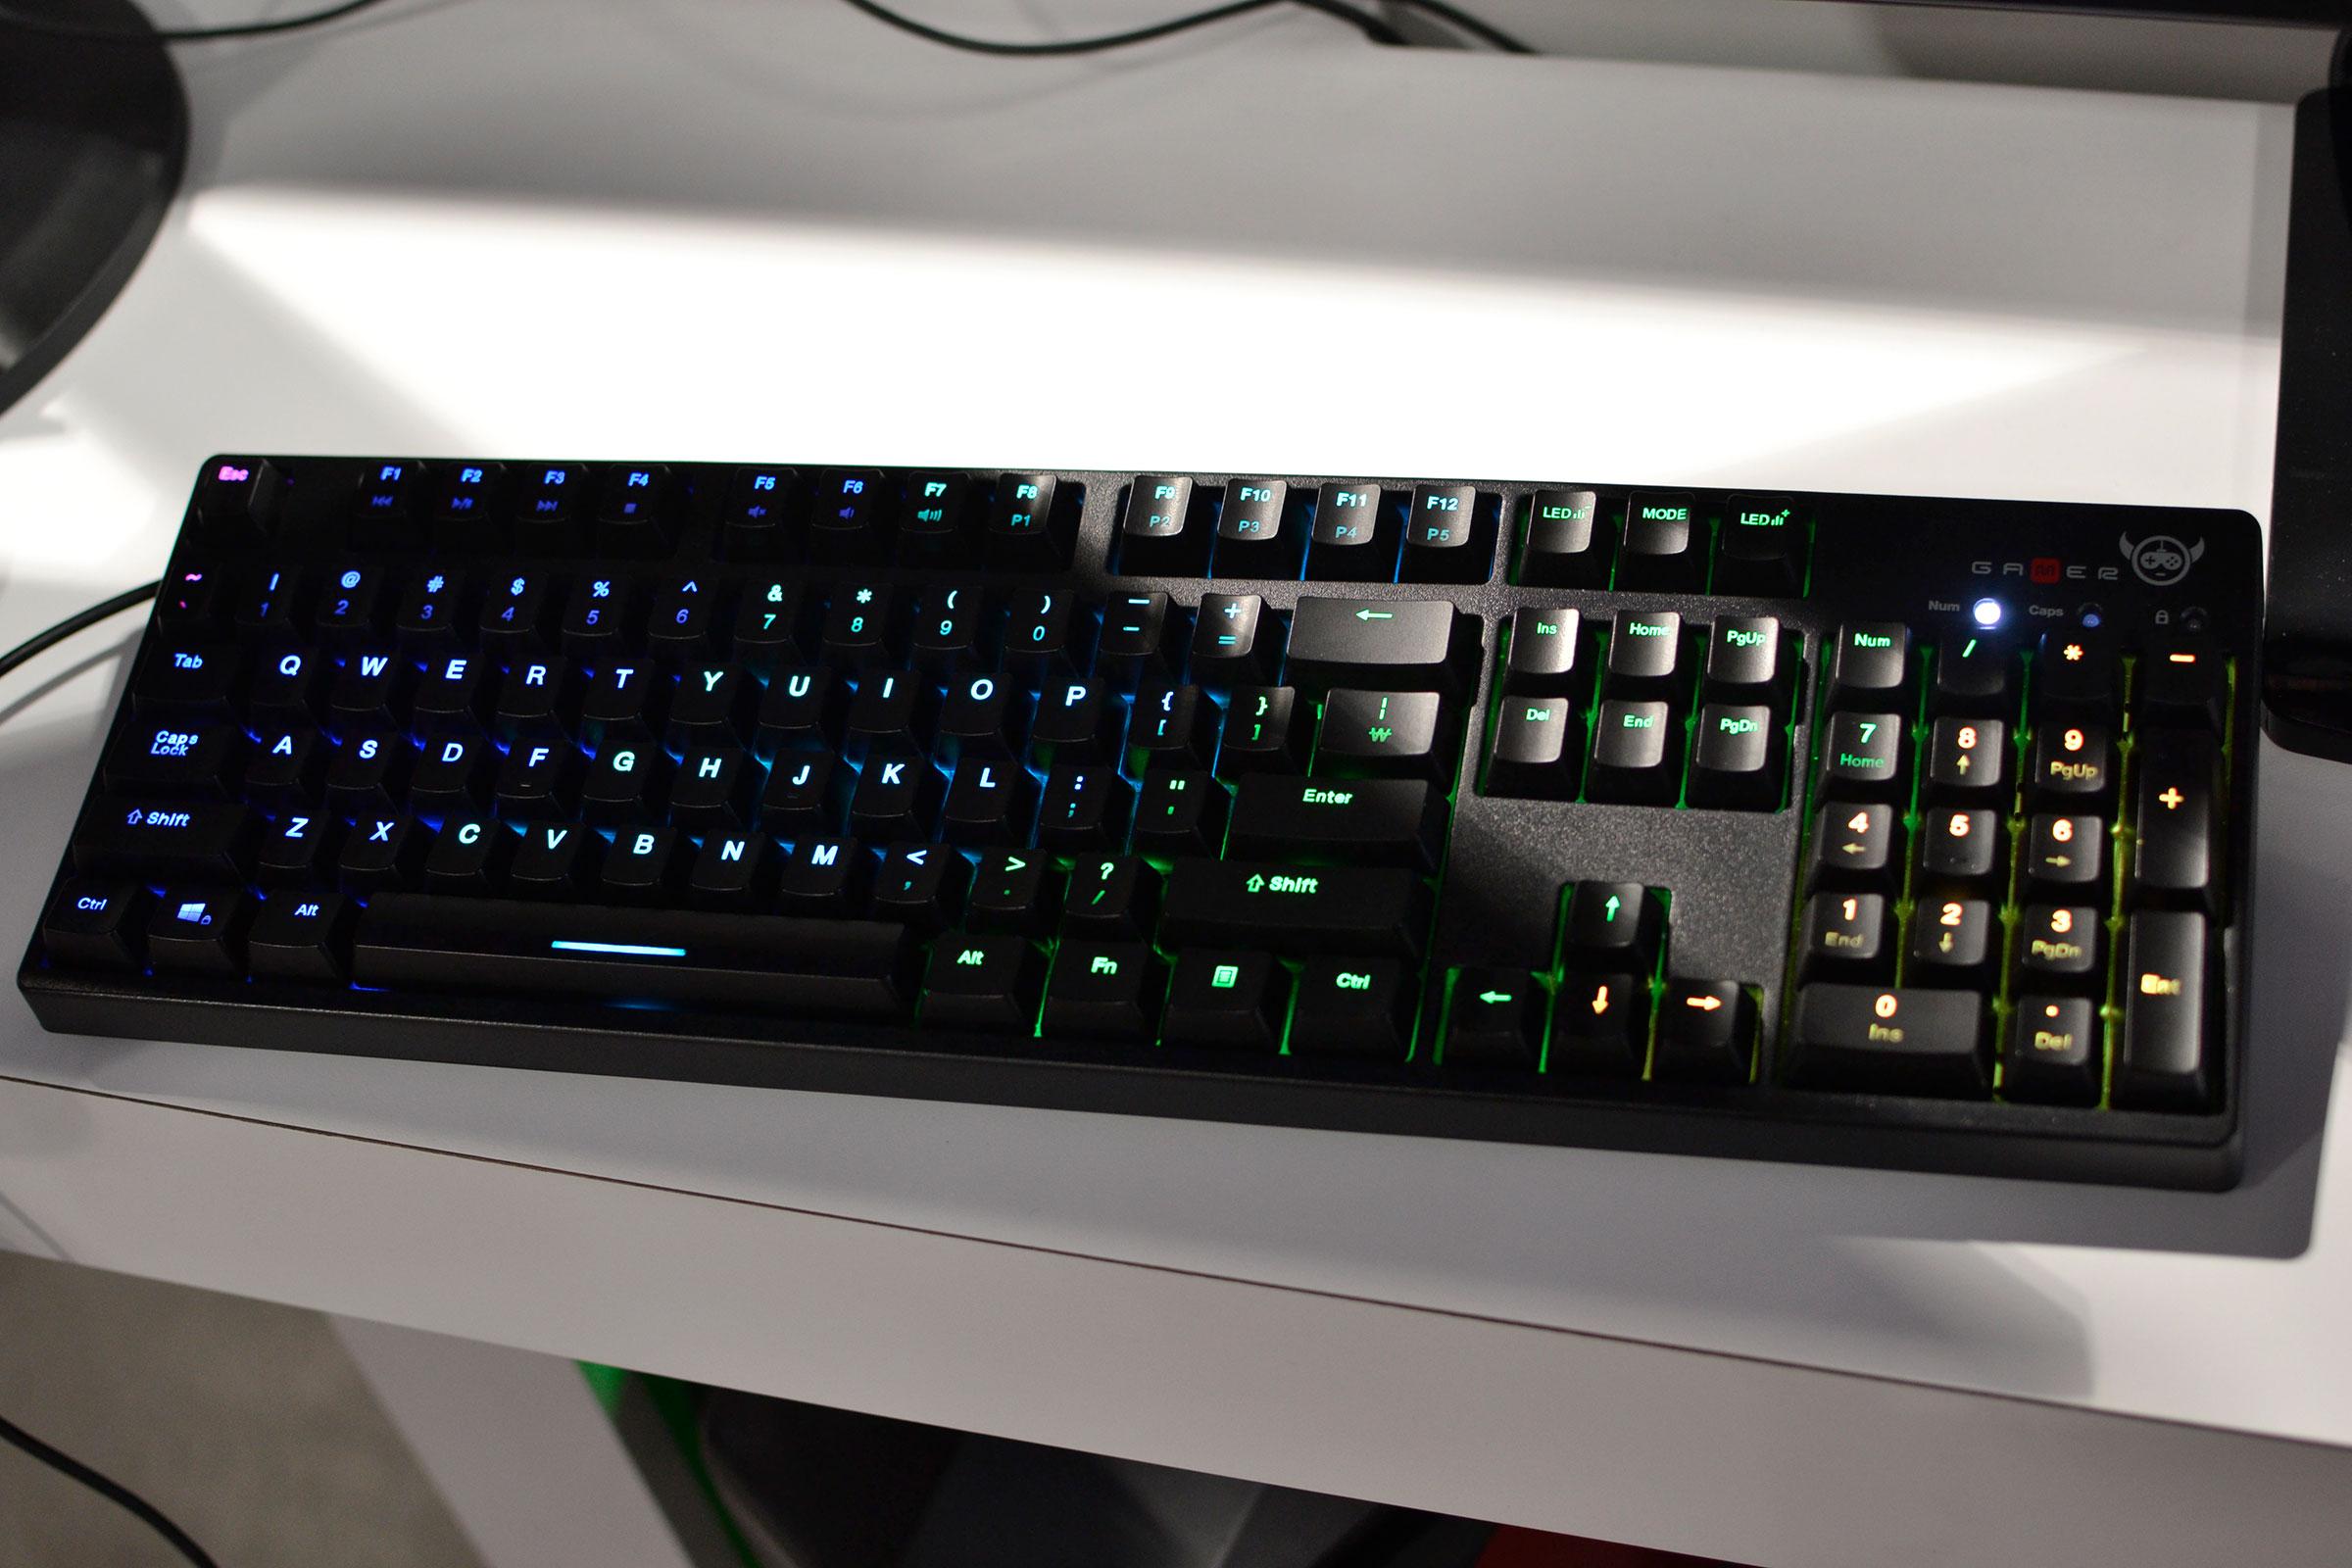 monoprice-keyboard.jpg